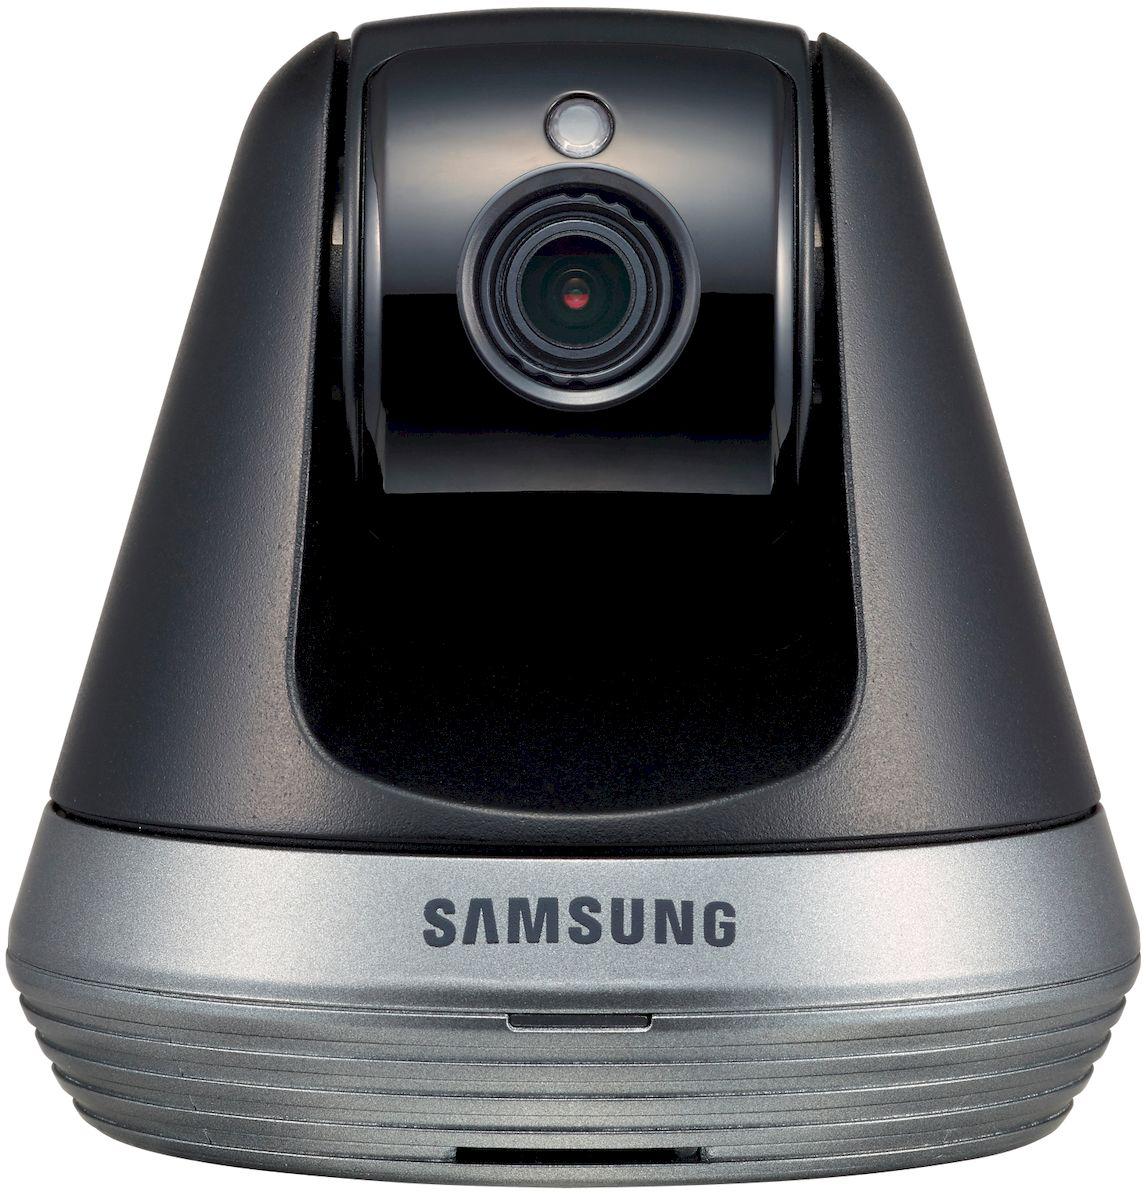 Samsung Видеоняня SmartCam SNH-V6410PN -  Радио и видеоняни